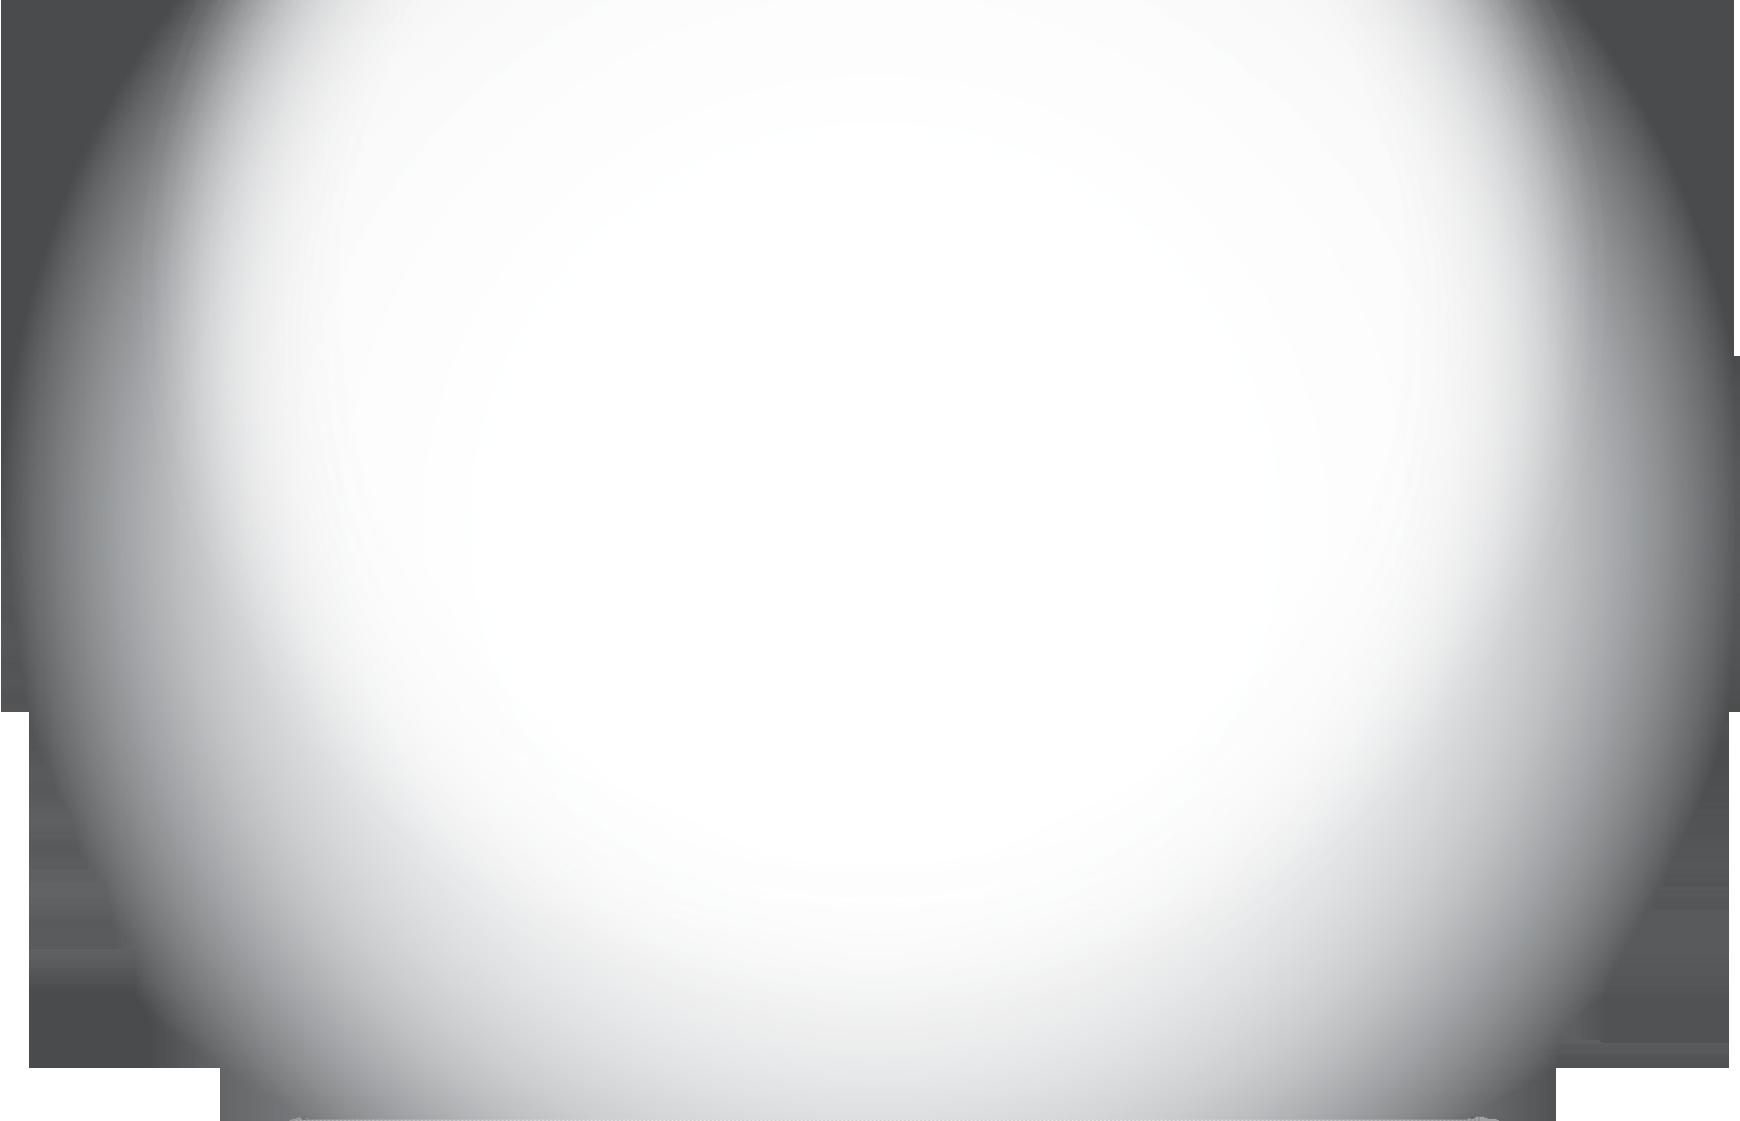 Spotlight PNG - Free Download Spot Light images - Free ...